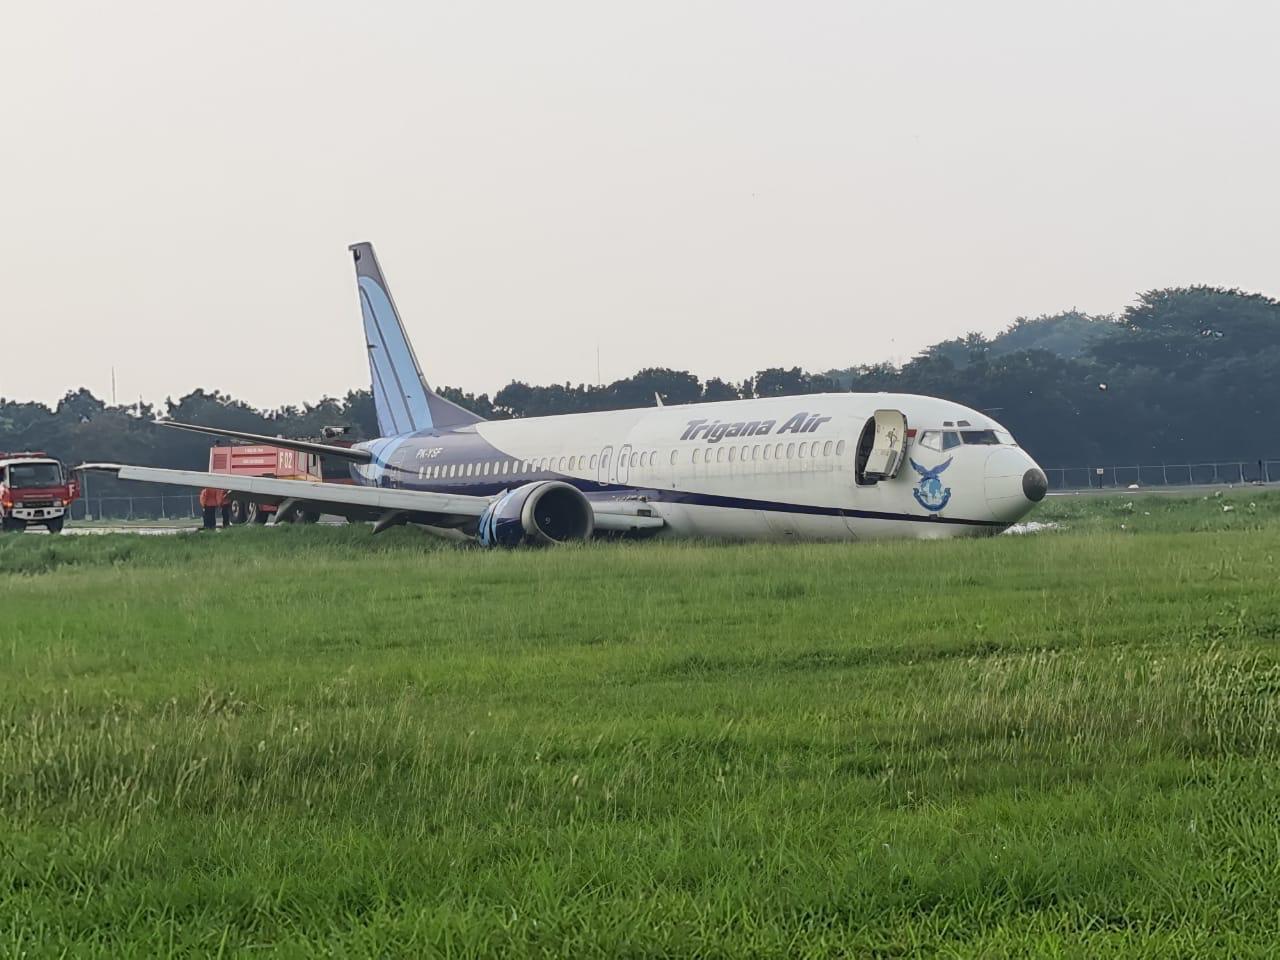 https: img.okezone.com content 2021 03 20 337 2381116 pesawat-trigana-air-tergelincir-di-halim-sejumlah-penerbangan-dialihkan-ke-soetta-hE6Q5tBsWJ.jpg